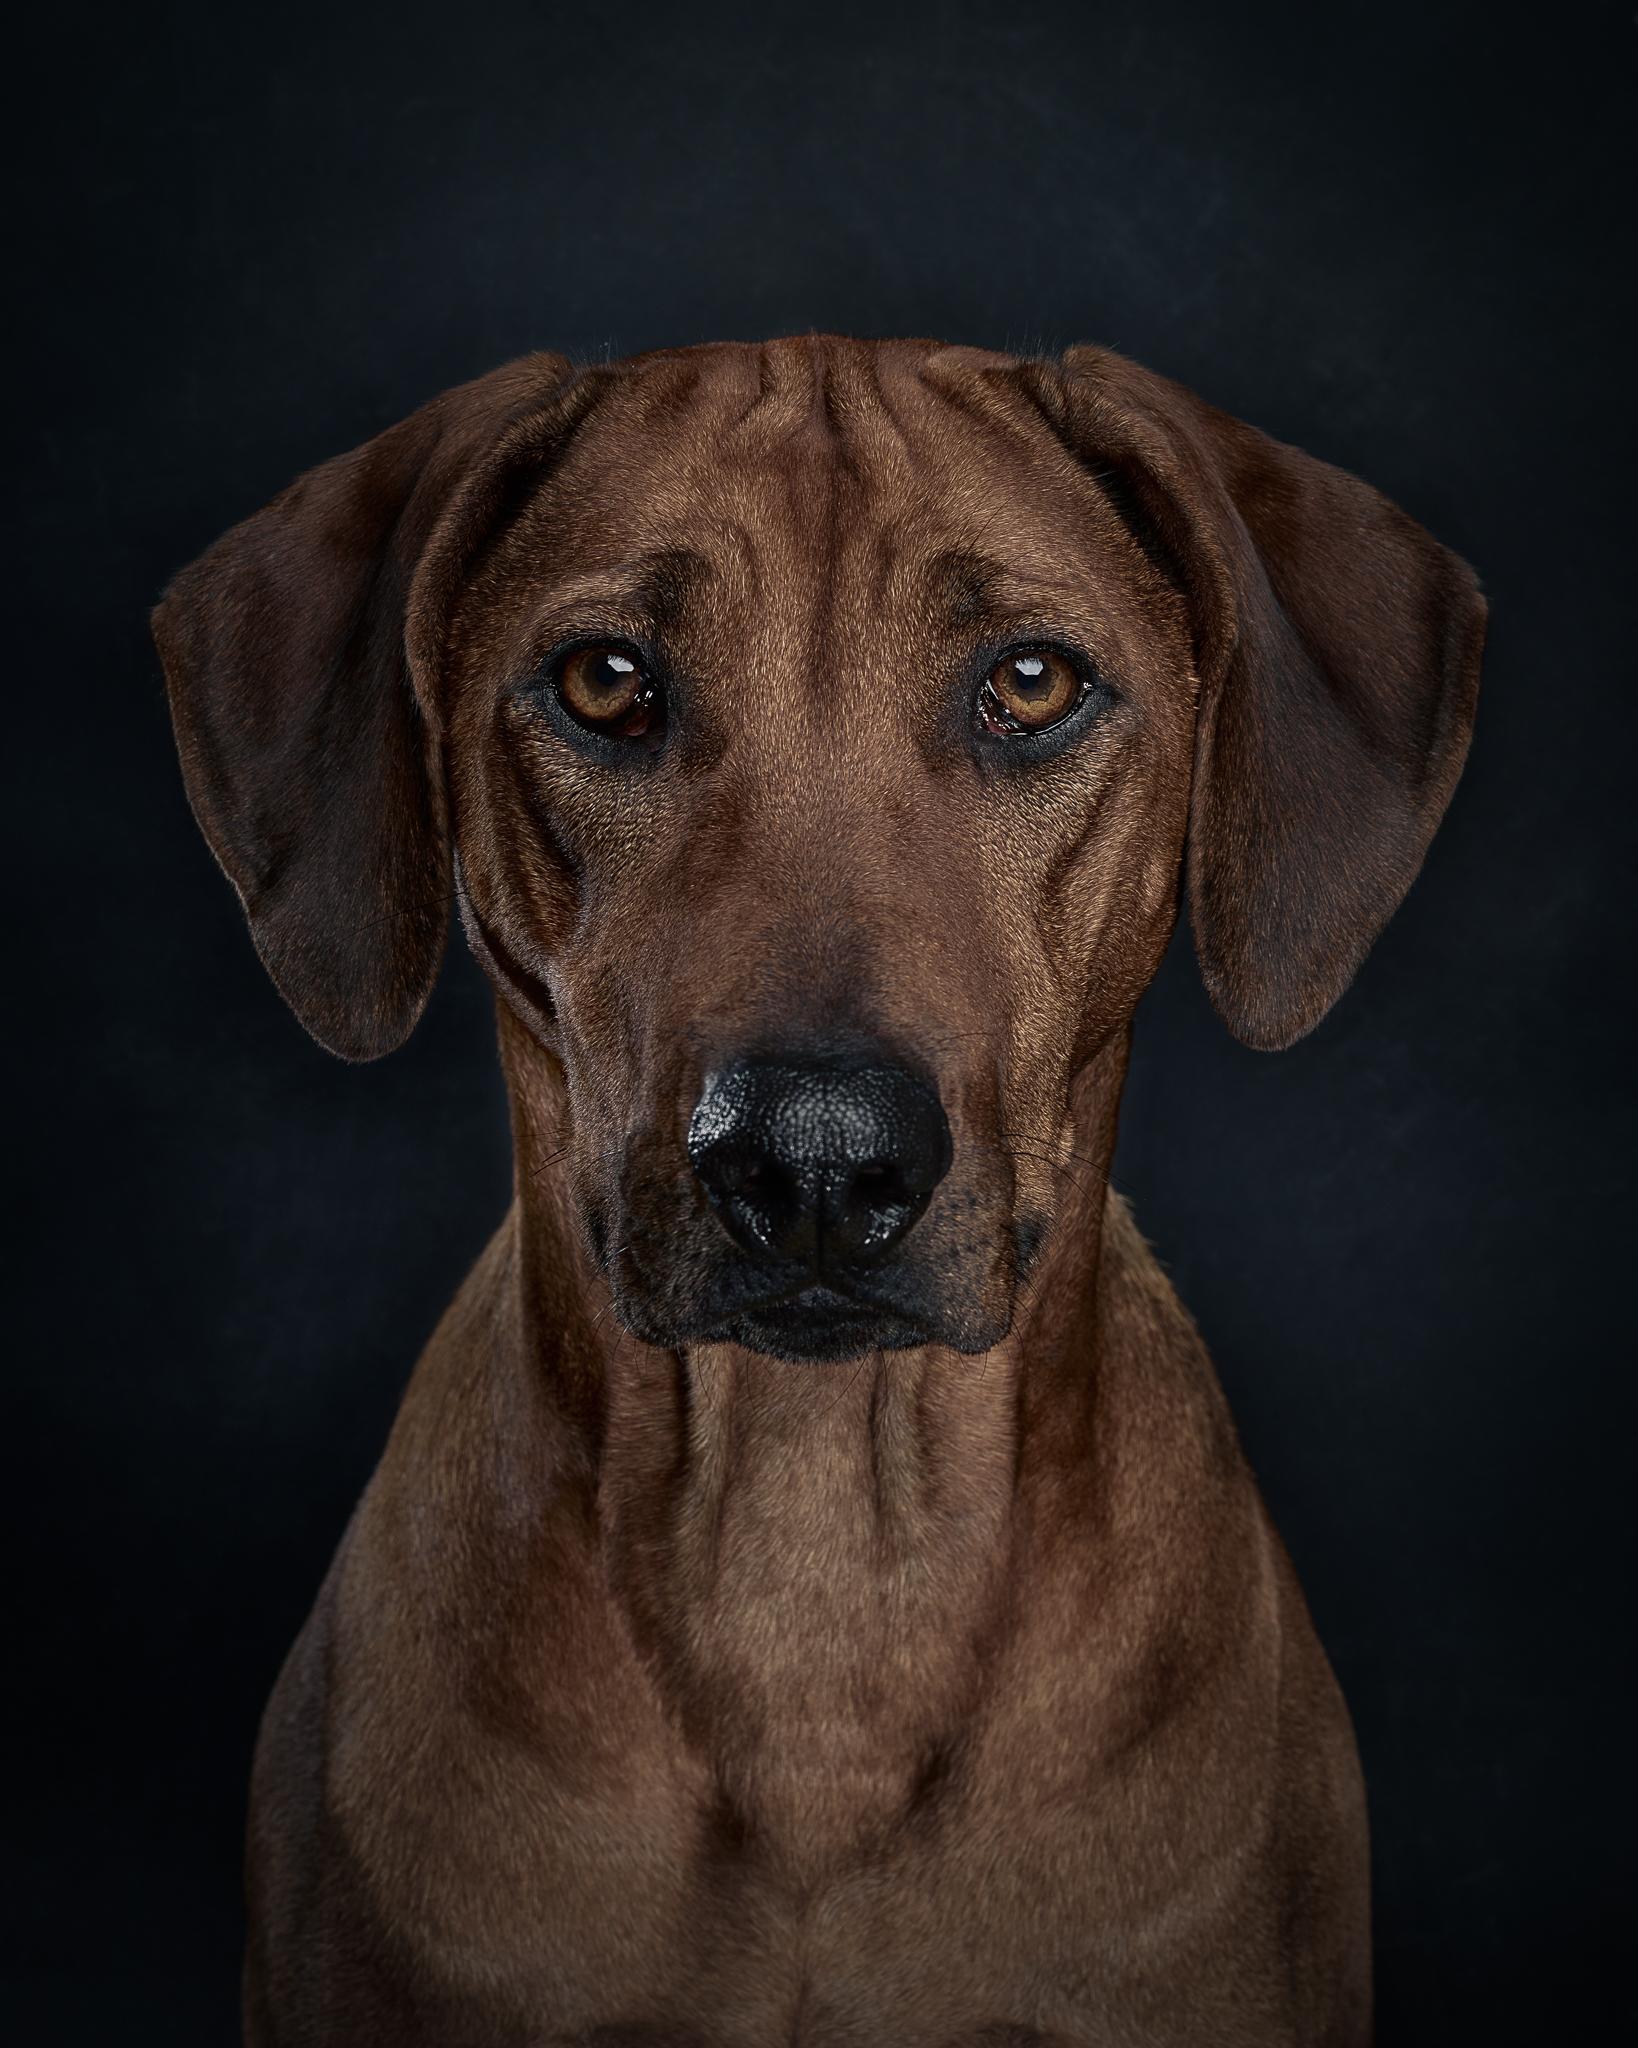 klaus-dyba-dog-photography-7.jpg